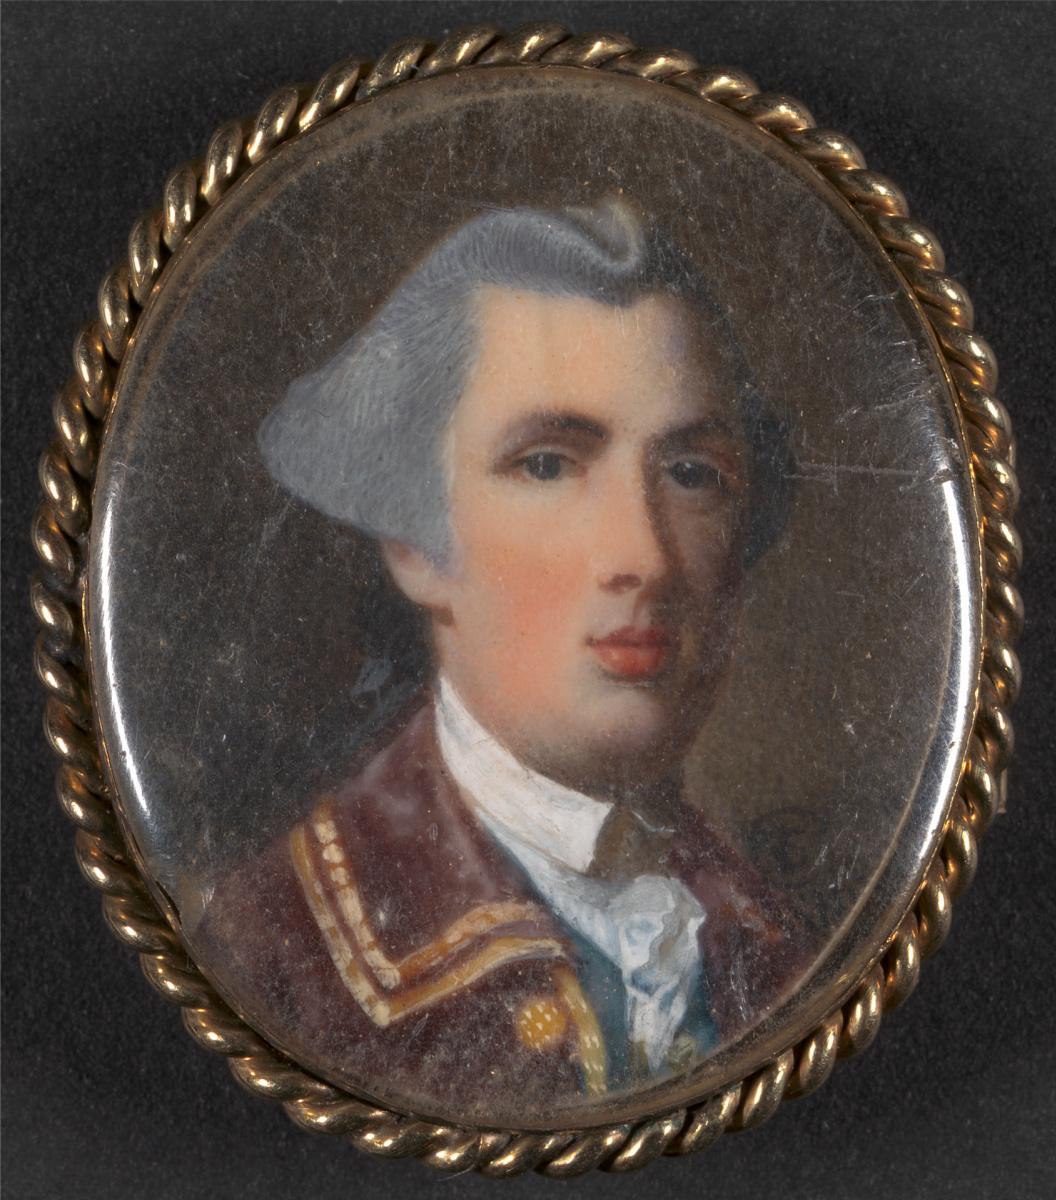 John Singleton Copley. Portrait of a young man